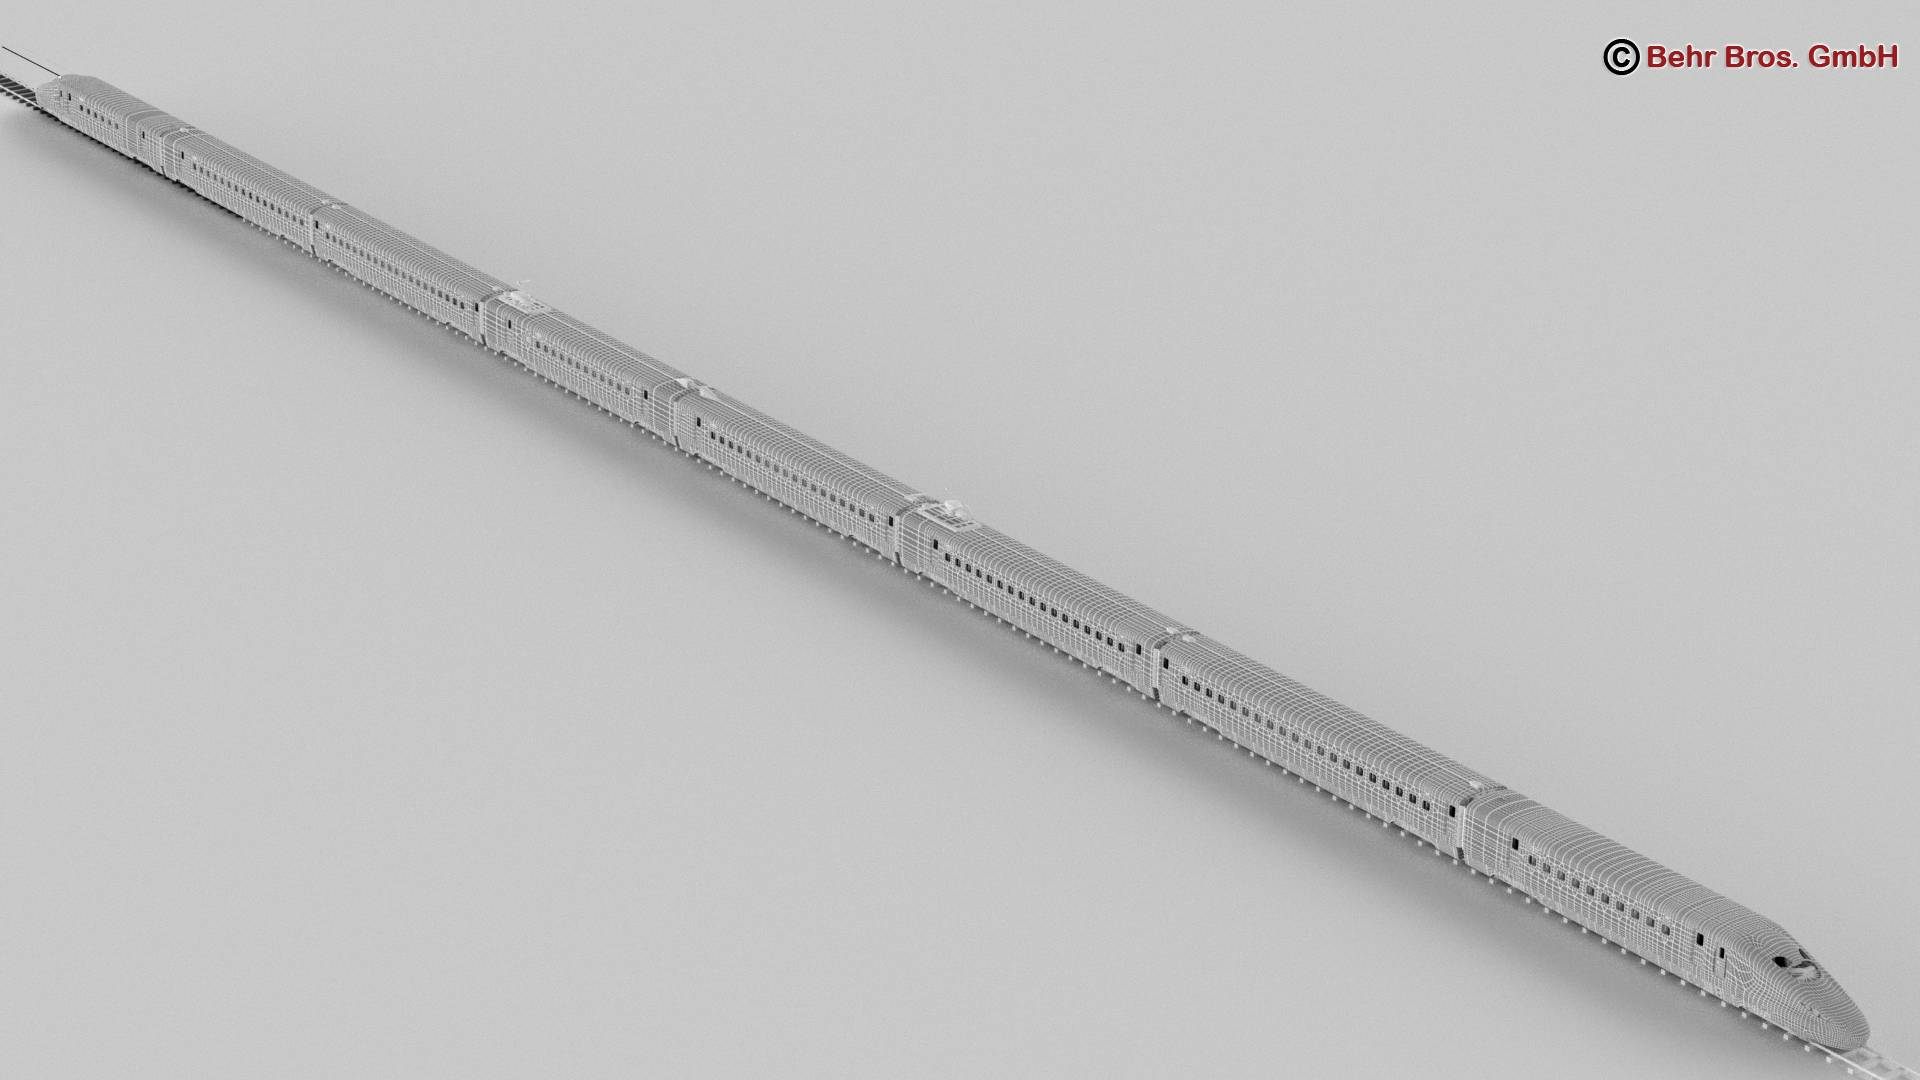 shinkansen e7 3d model 3ds max fbx c4d lwo ma mb obj 265676